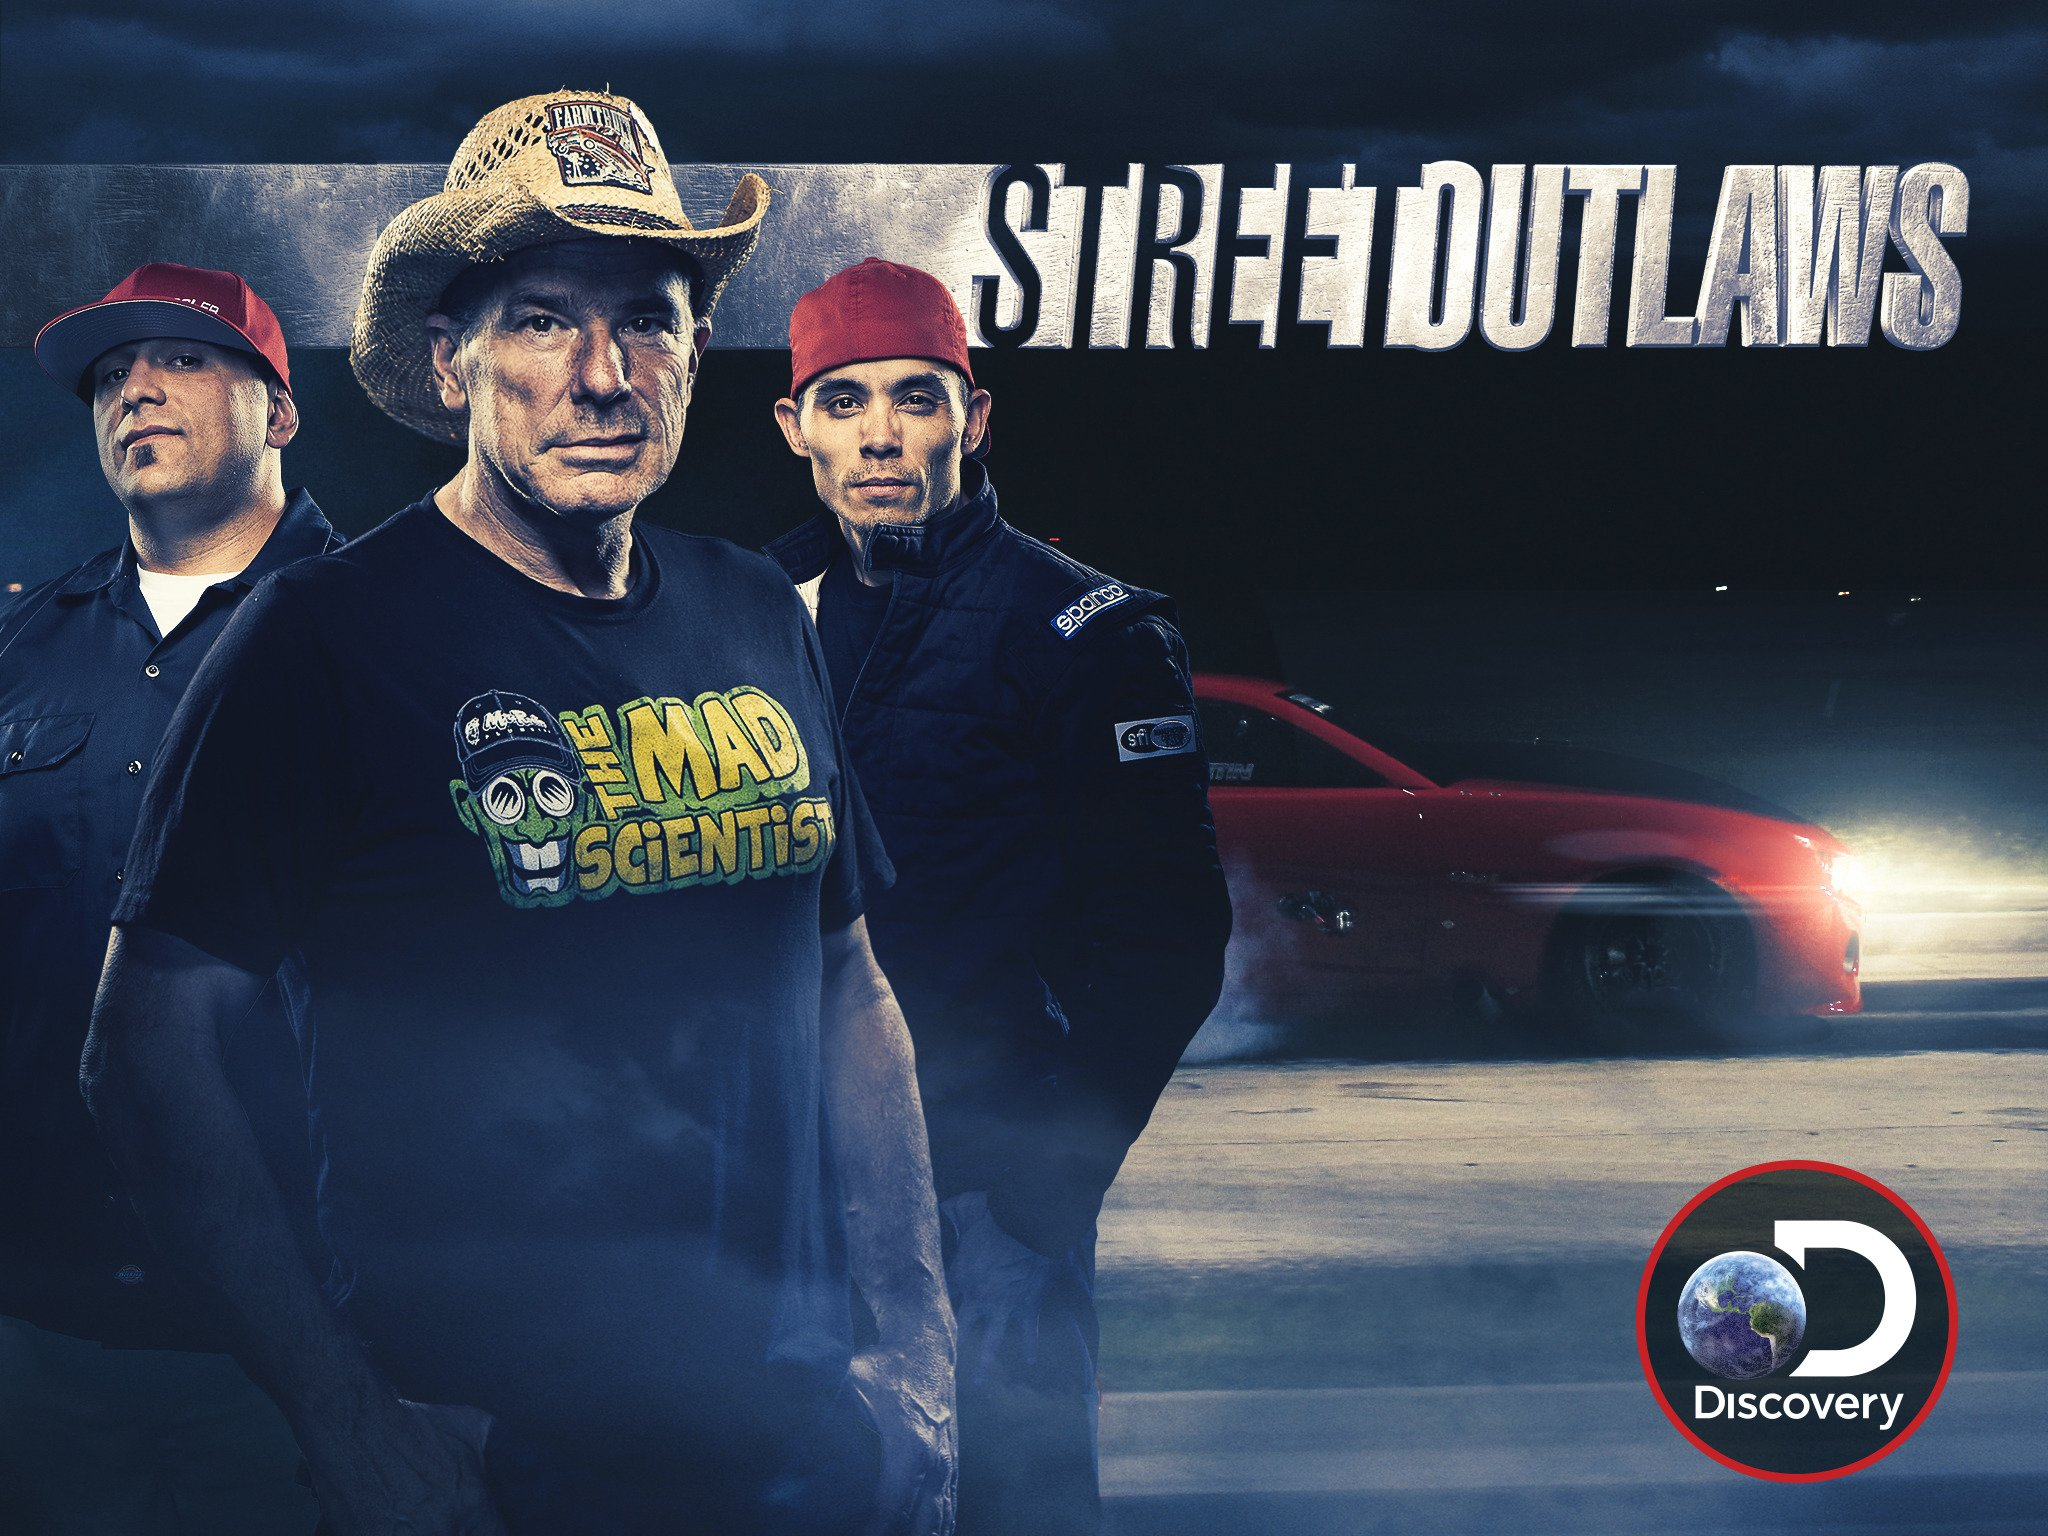 street outlaws season 11 episode 12 online